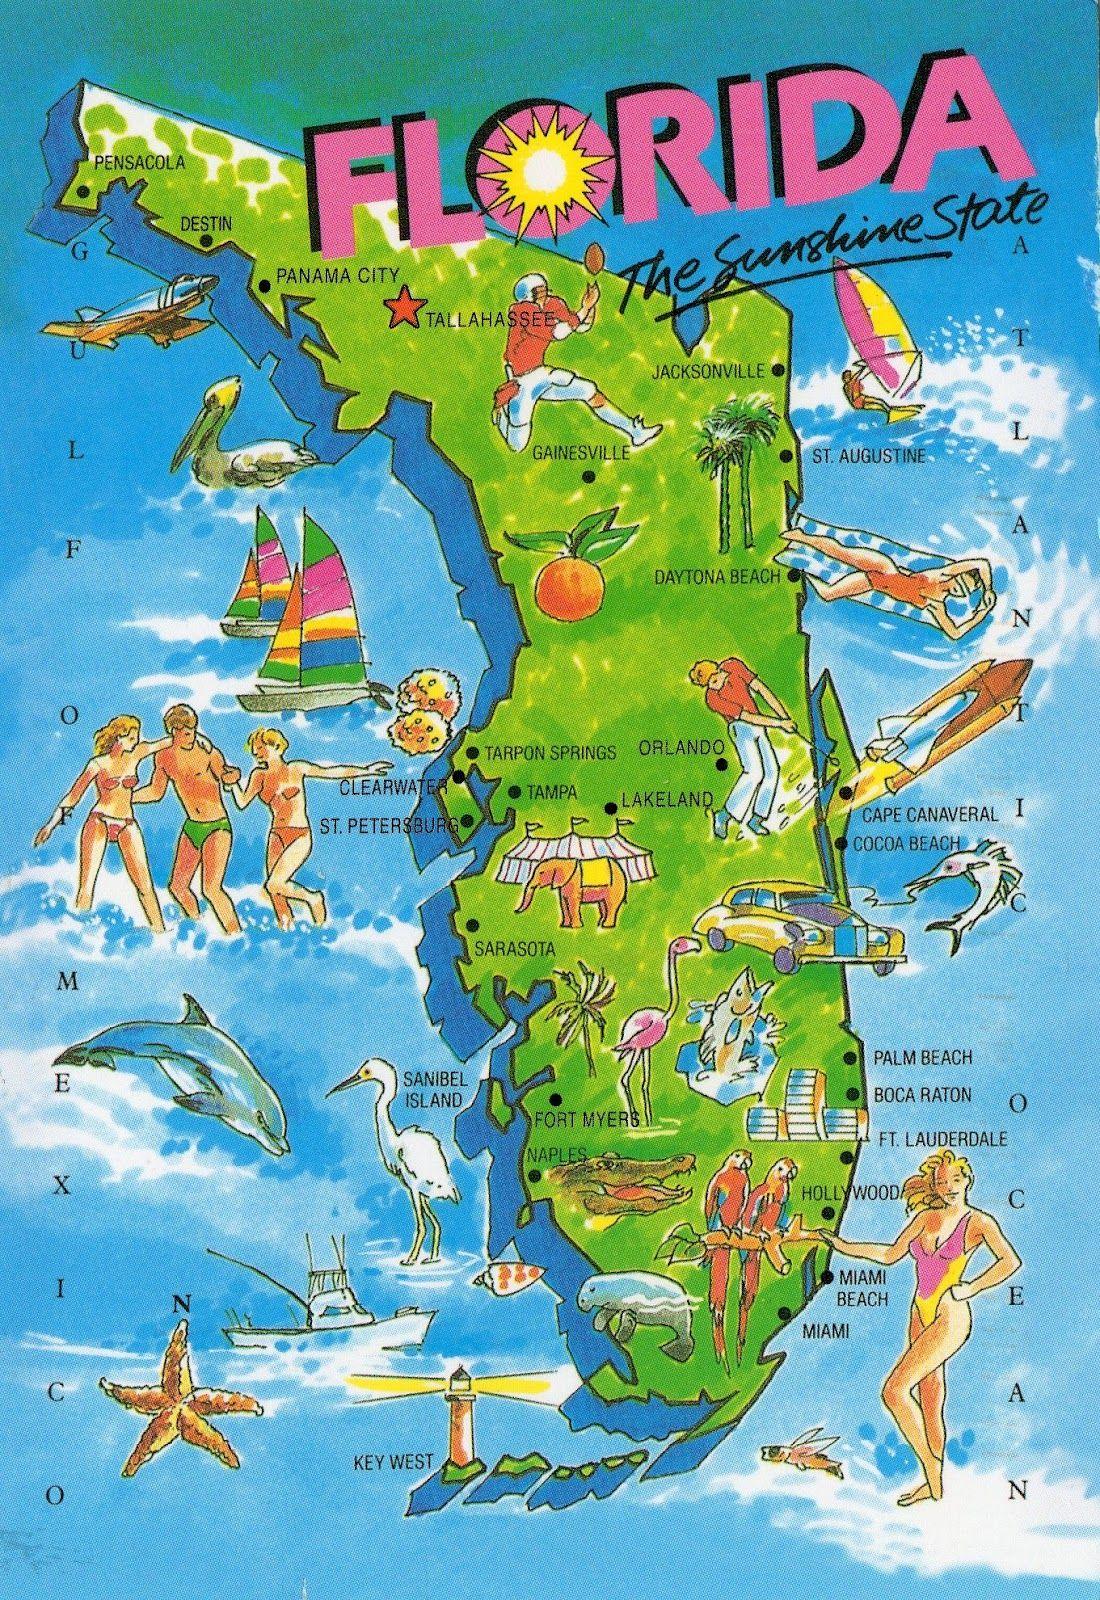 Pincody On National Parks Service | Sunshine State, Vintage - Florida Cartoon Map